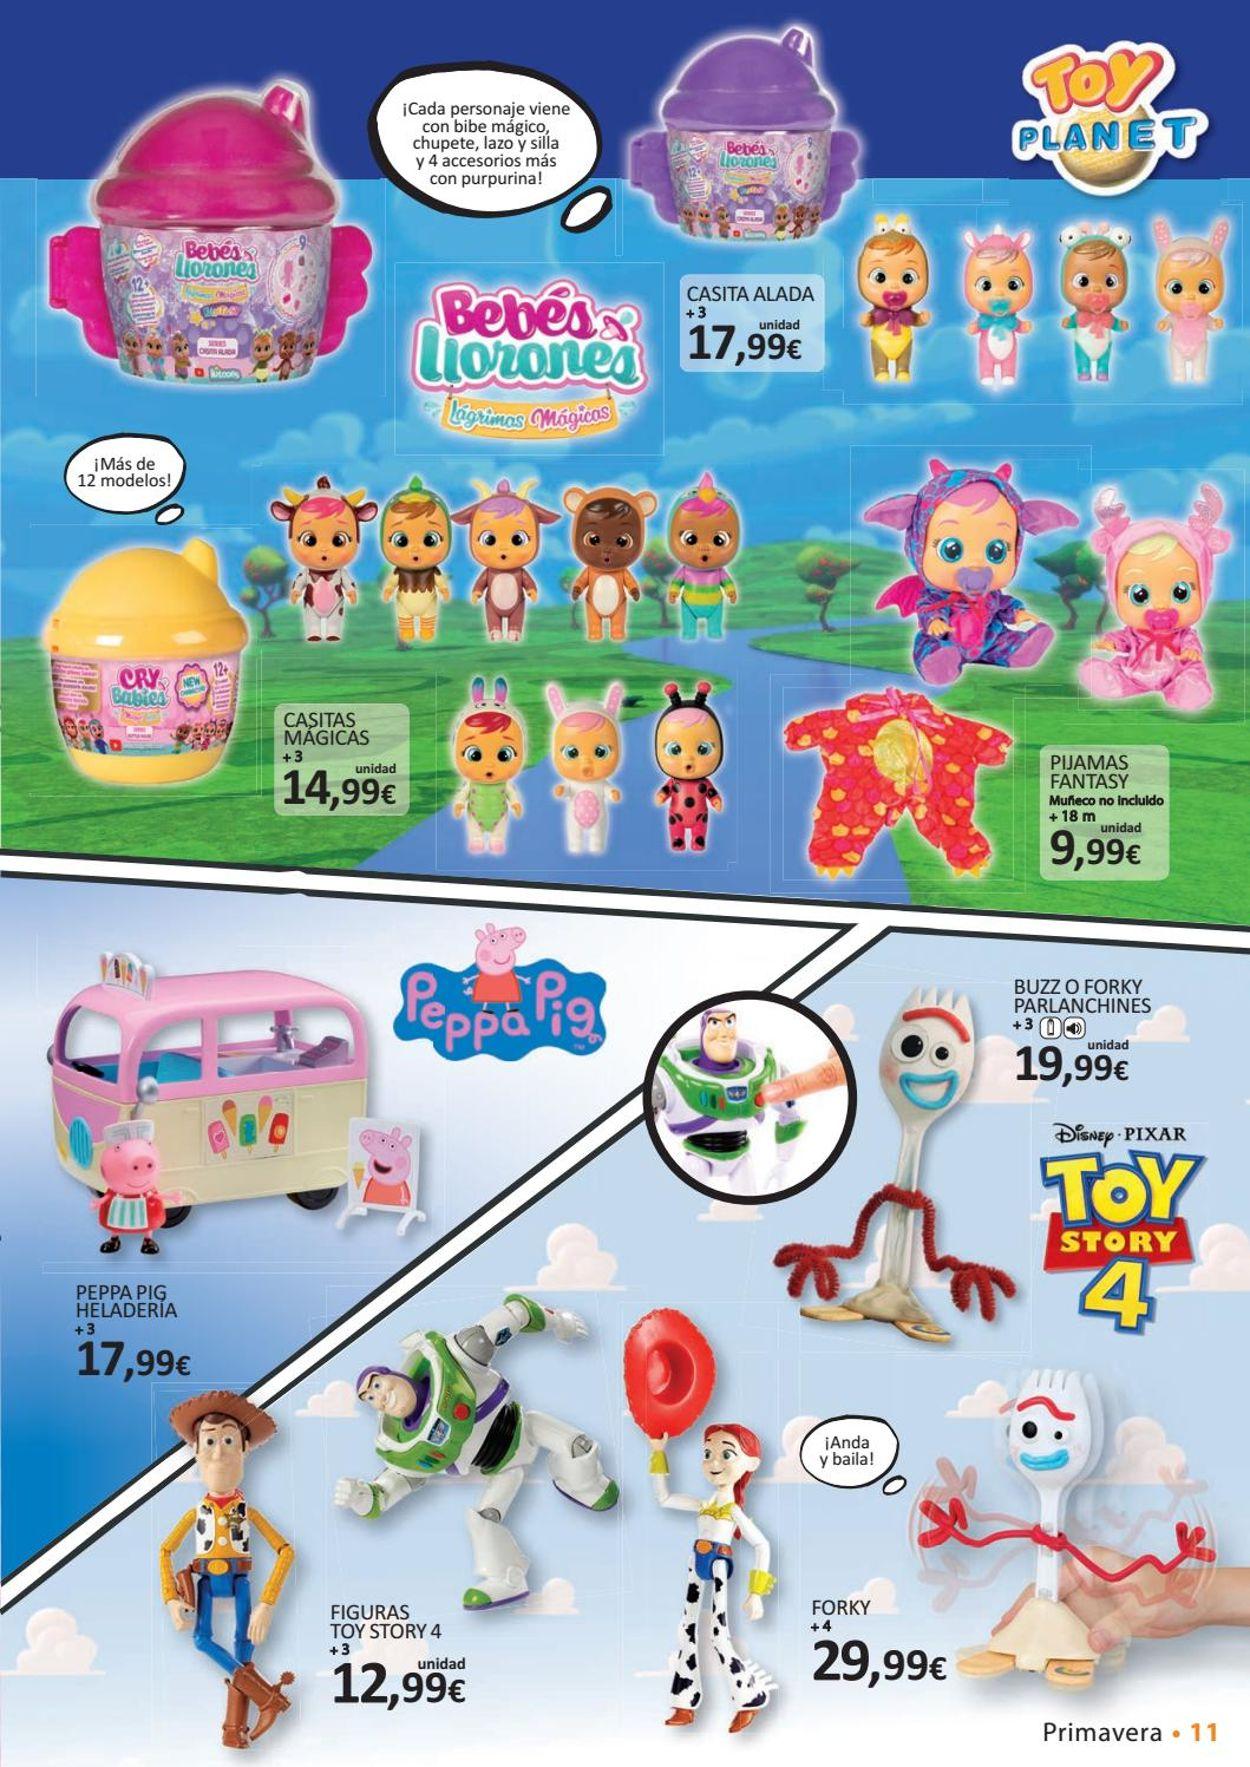 Toy Planet Folleto - 15.05-15.06.2020 (Página 11)